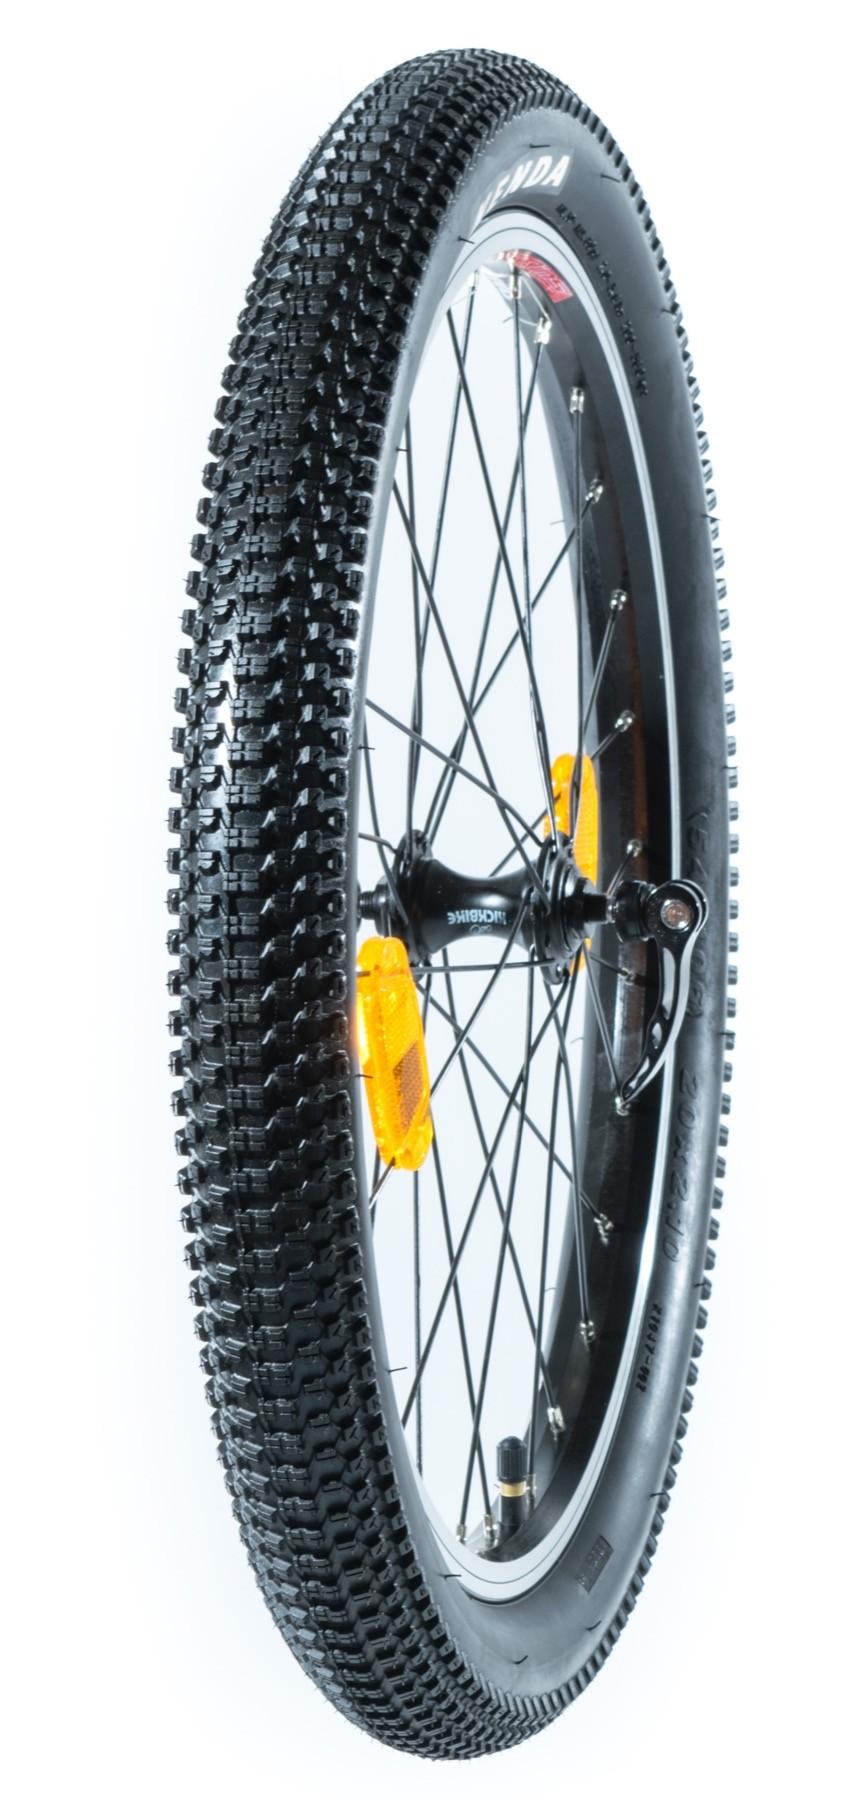 "Rear wheel 20"" complete (Cross MAX 20V)"